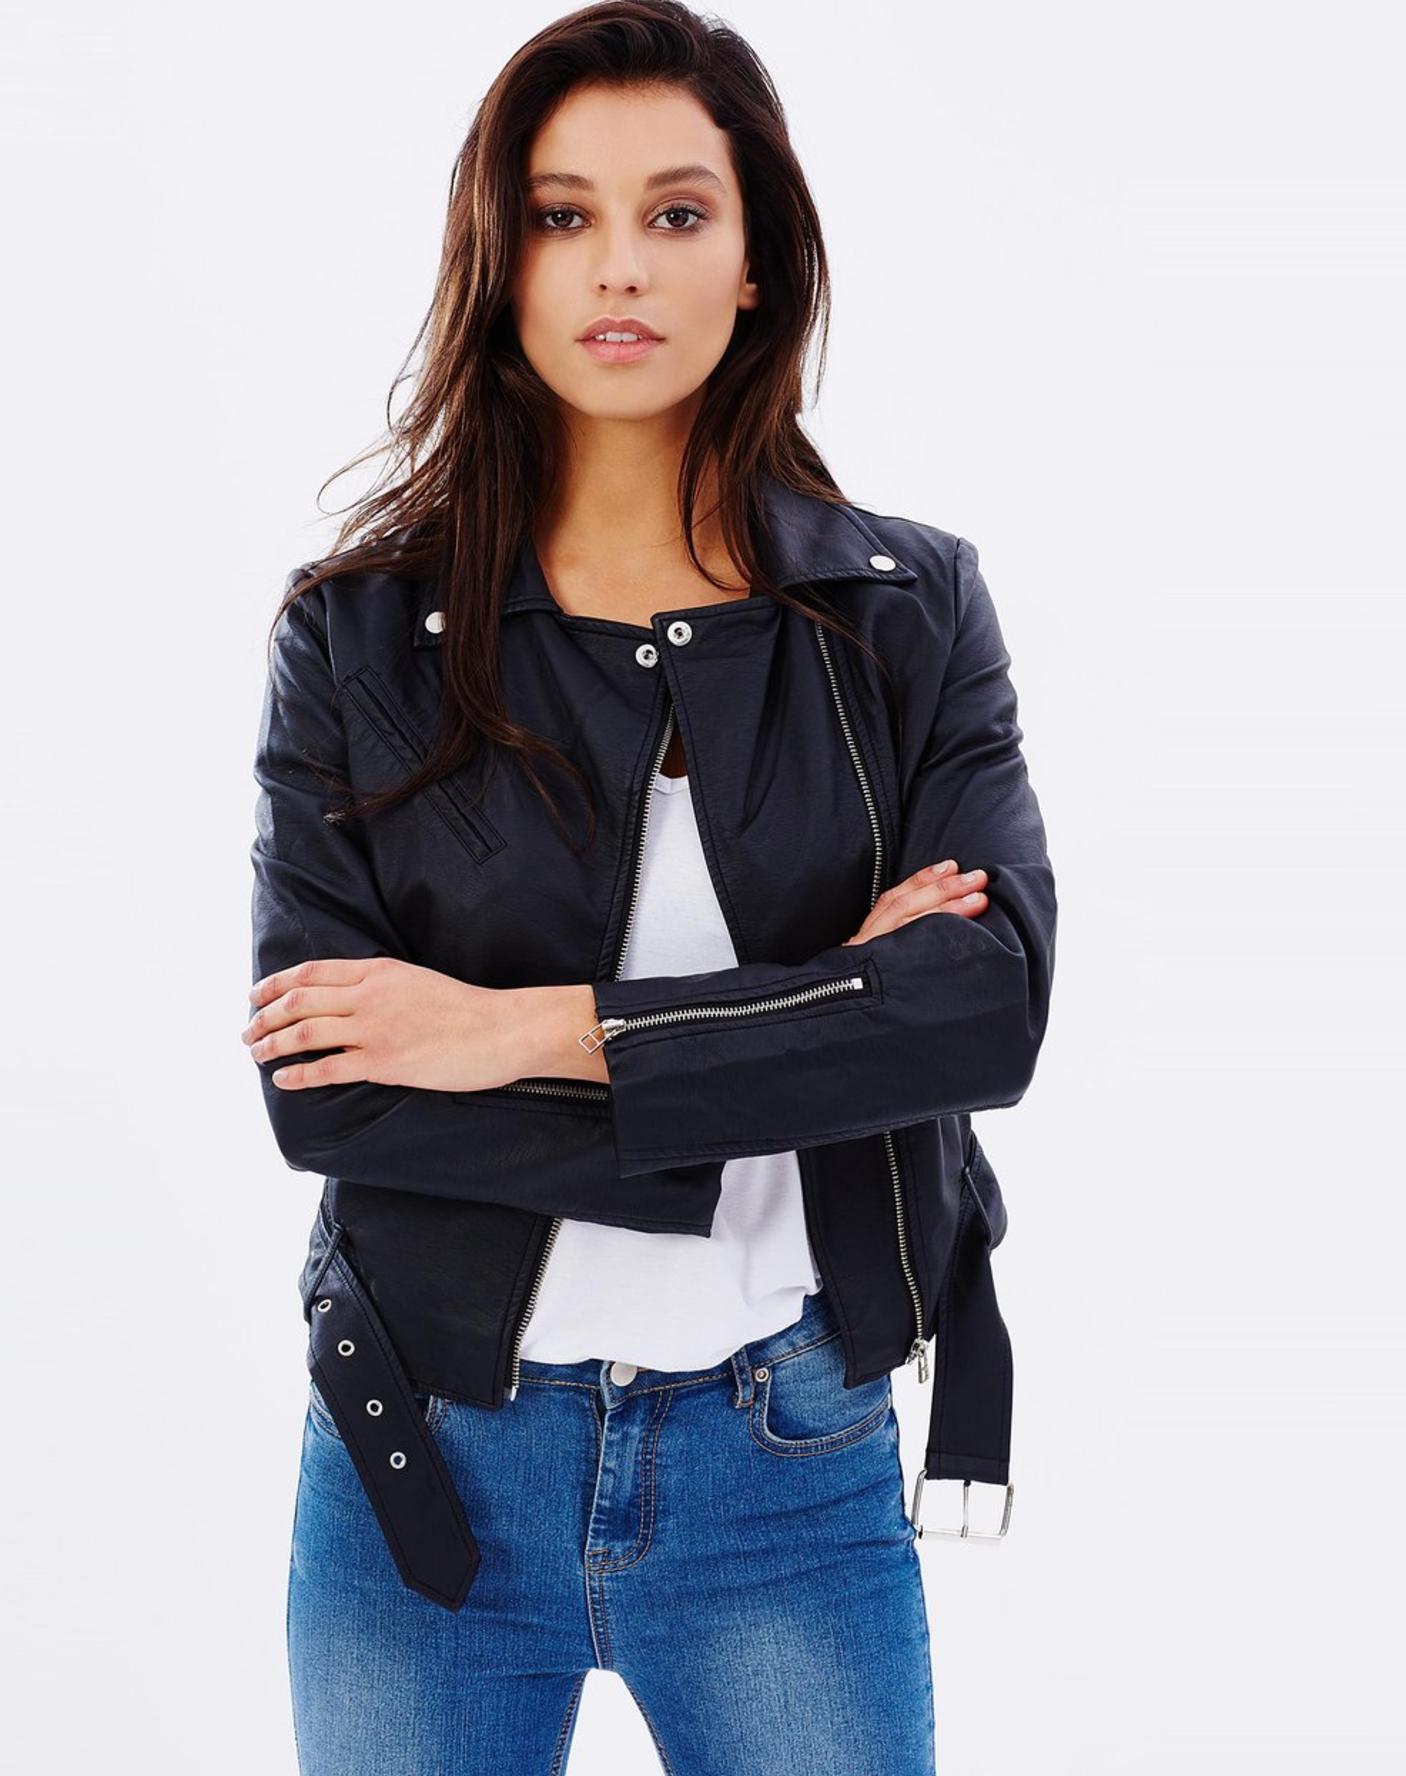 Lioness Lucca biker jacket $89.95